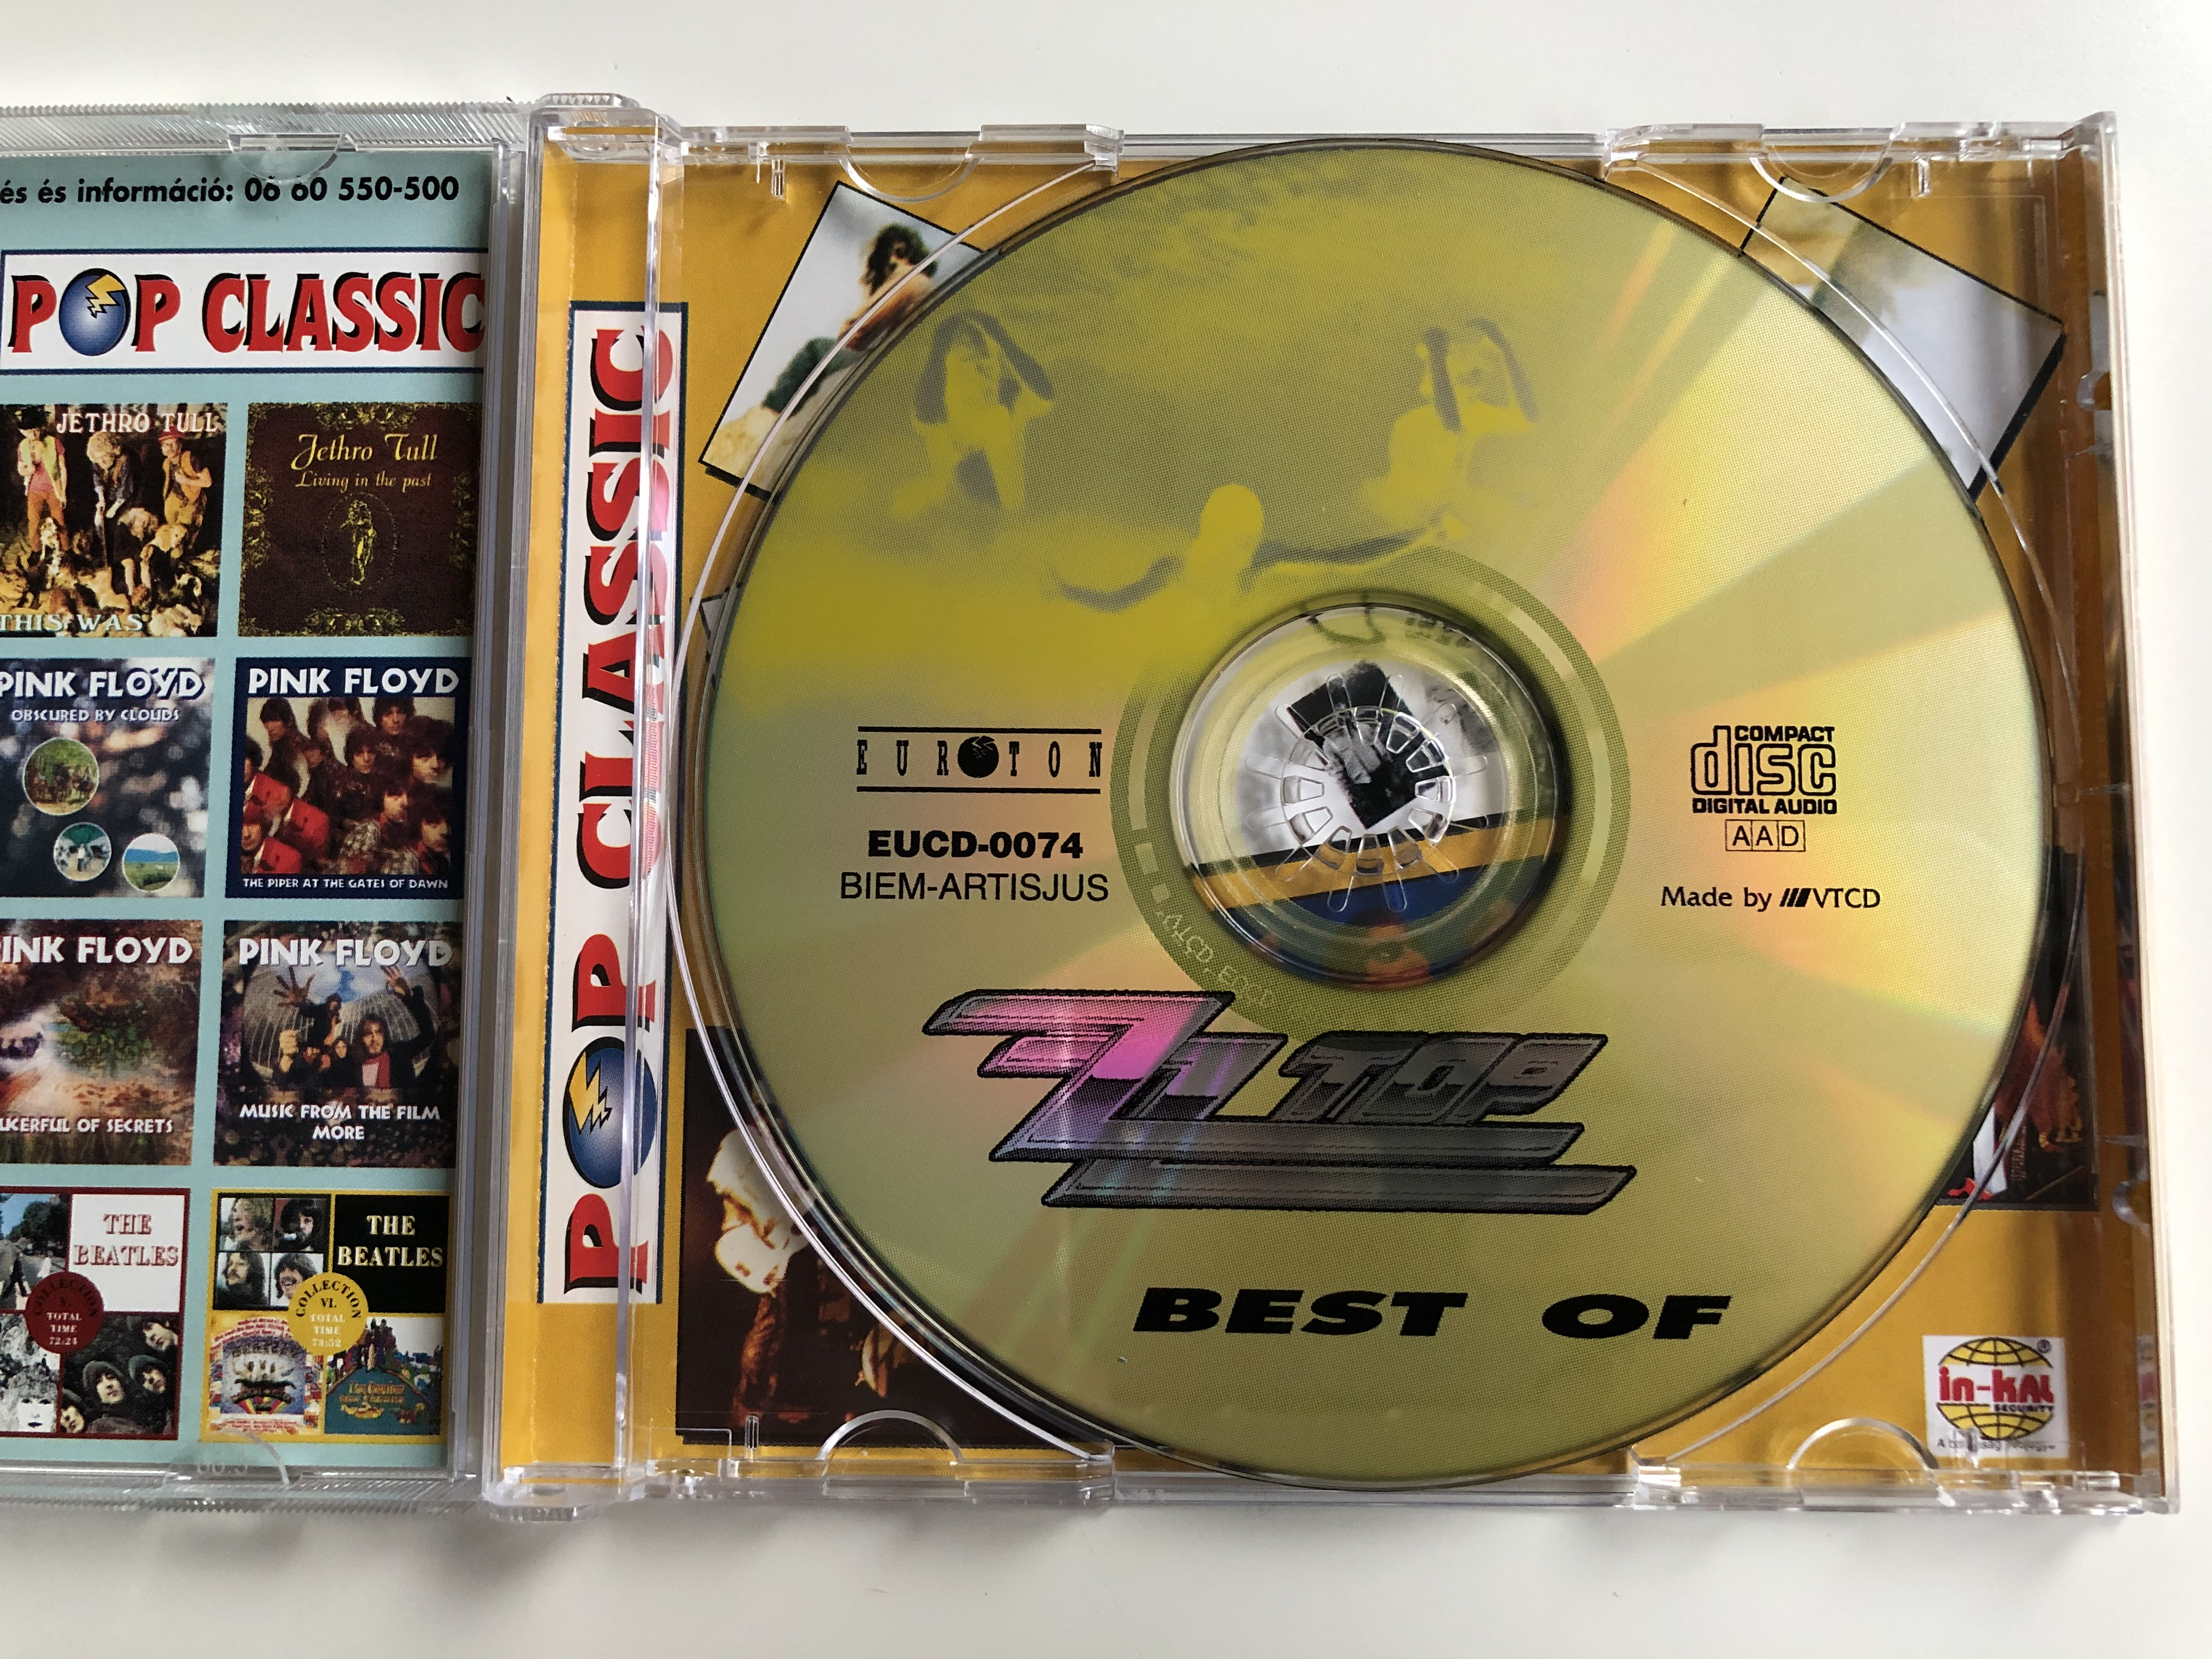 zz-top-best-of-pop-classic-euroton-audio-cd-eucd-0074-2-.jpg